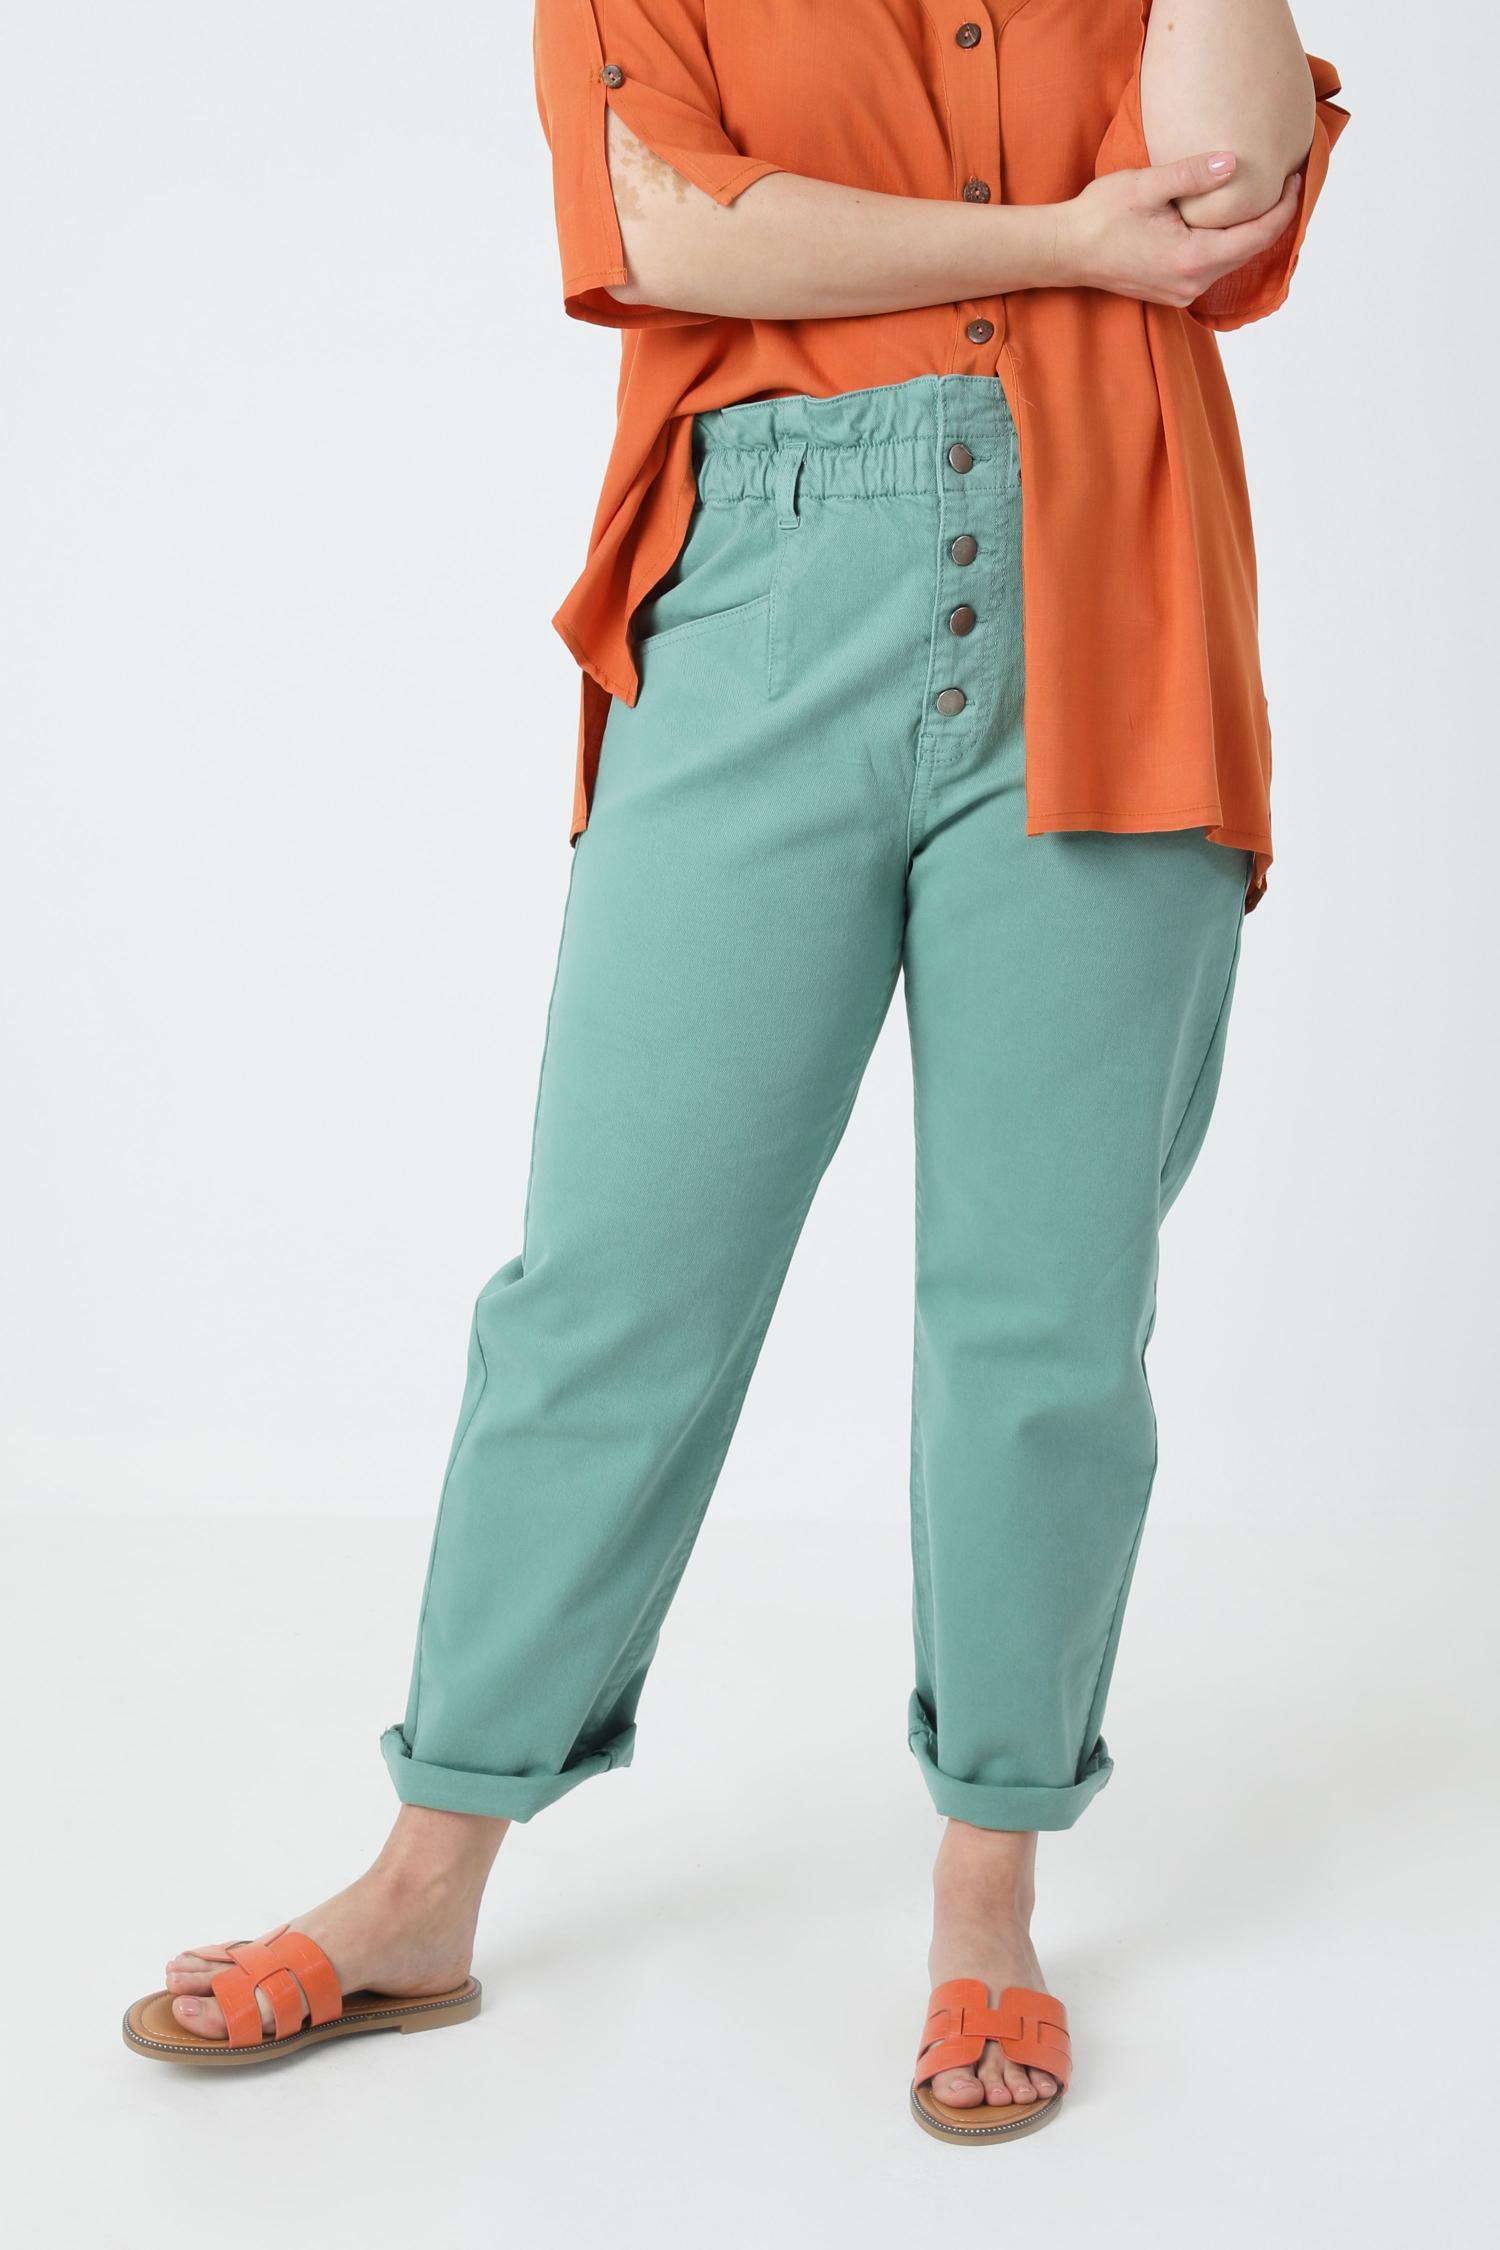 Colored organic cotton pants (shipping April 20/25)